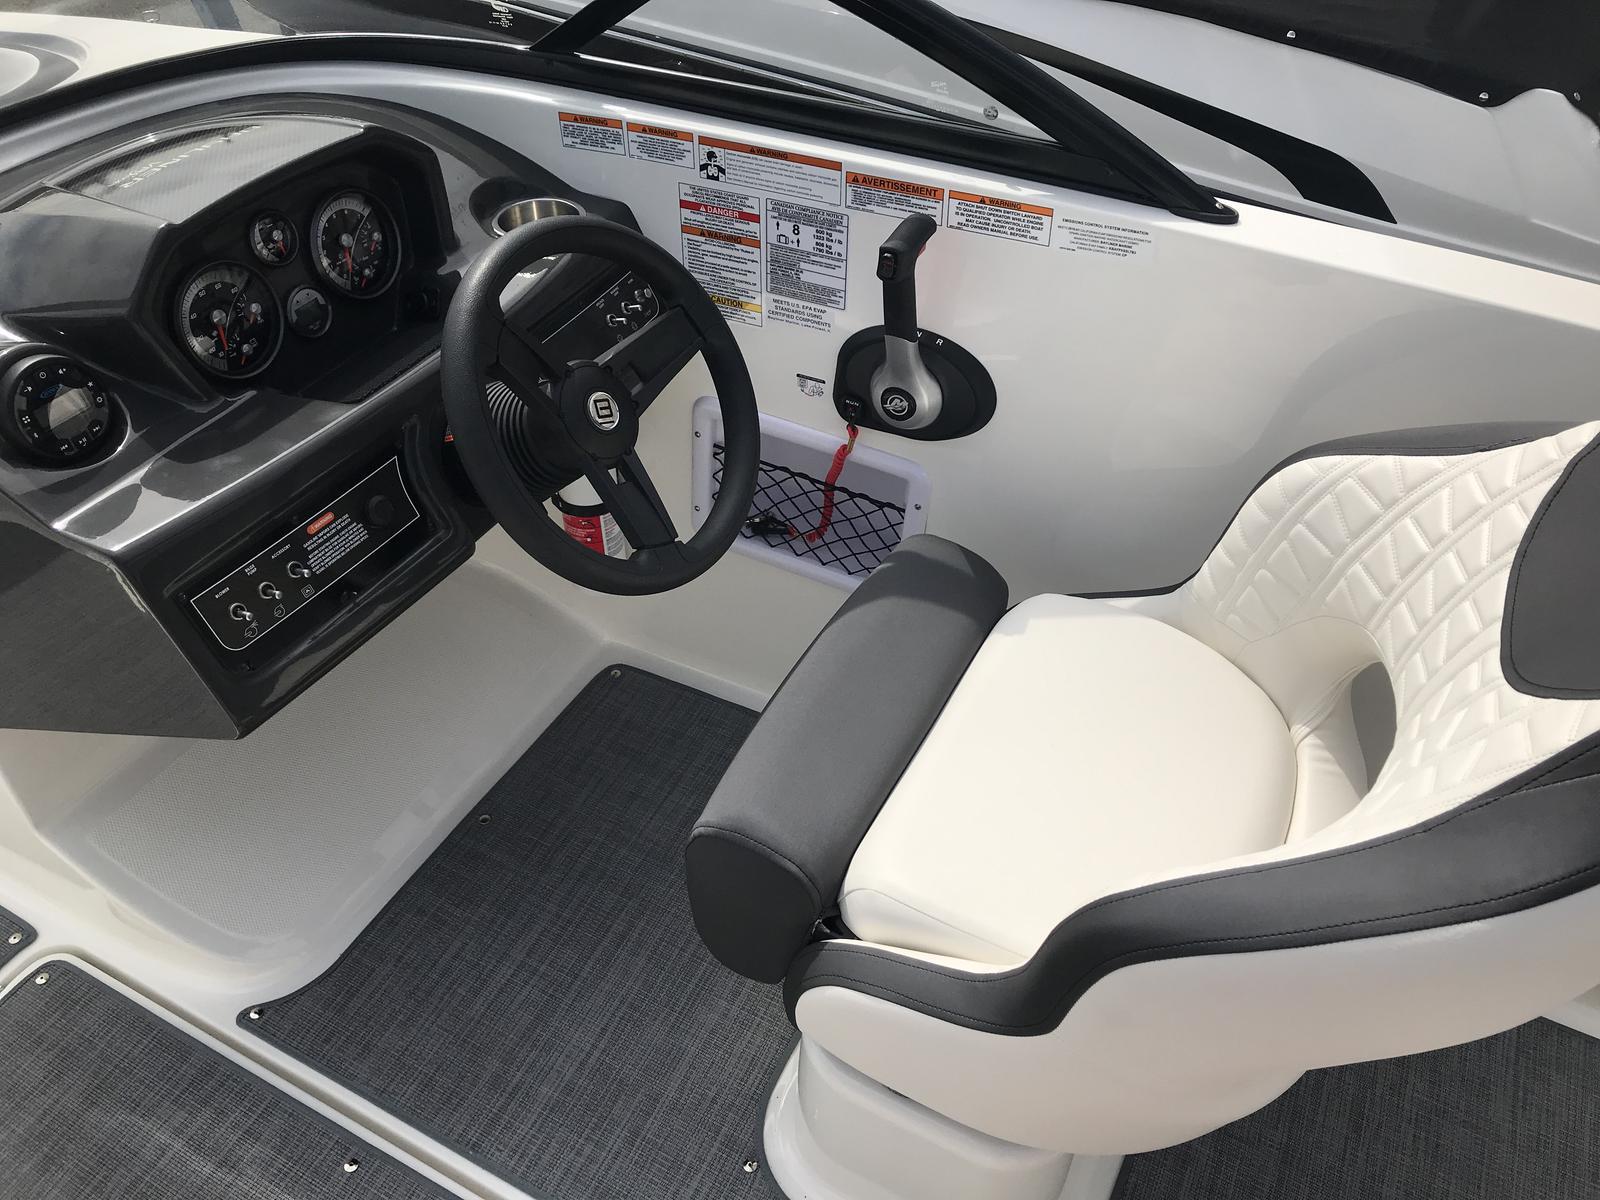 2019 Bayliner boat for sale, model of the boat is VR5 Bowrider & Image # 2 of 22